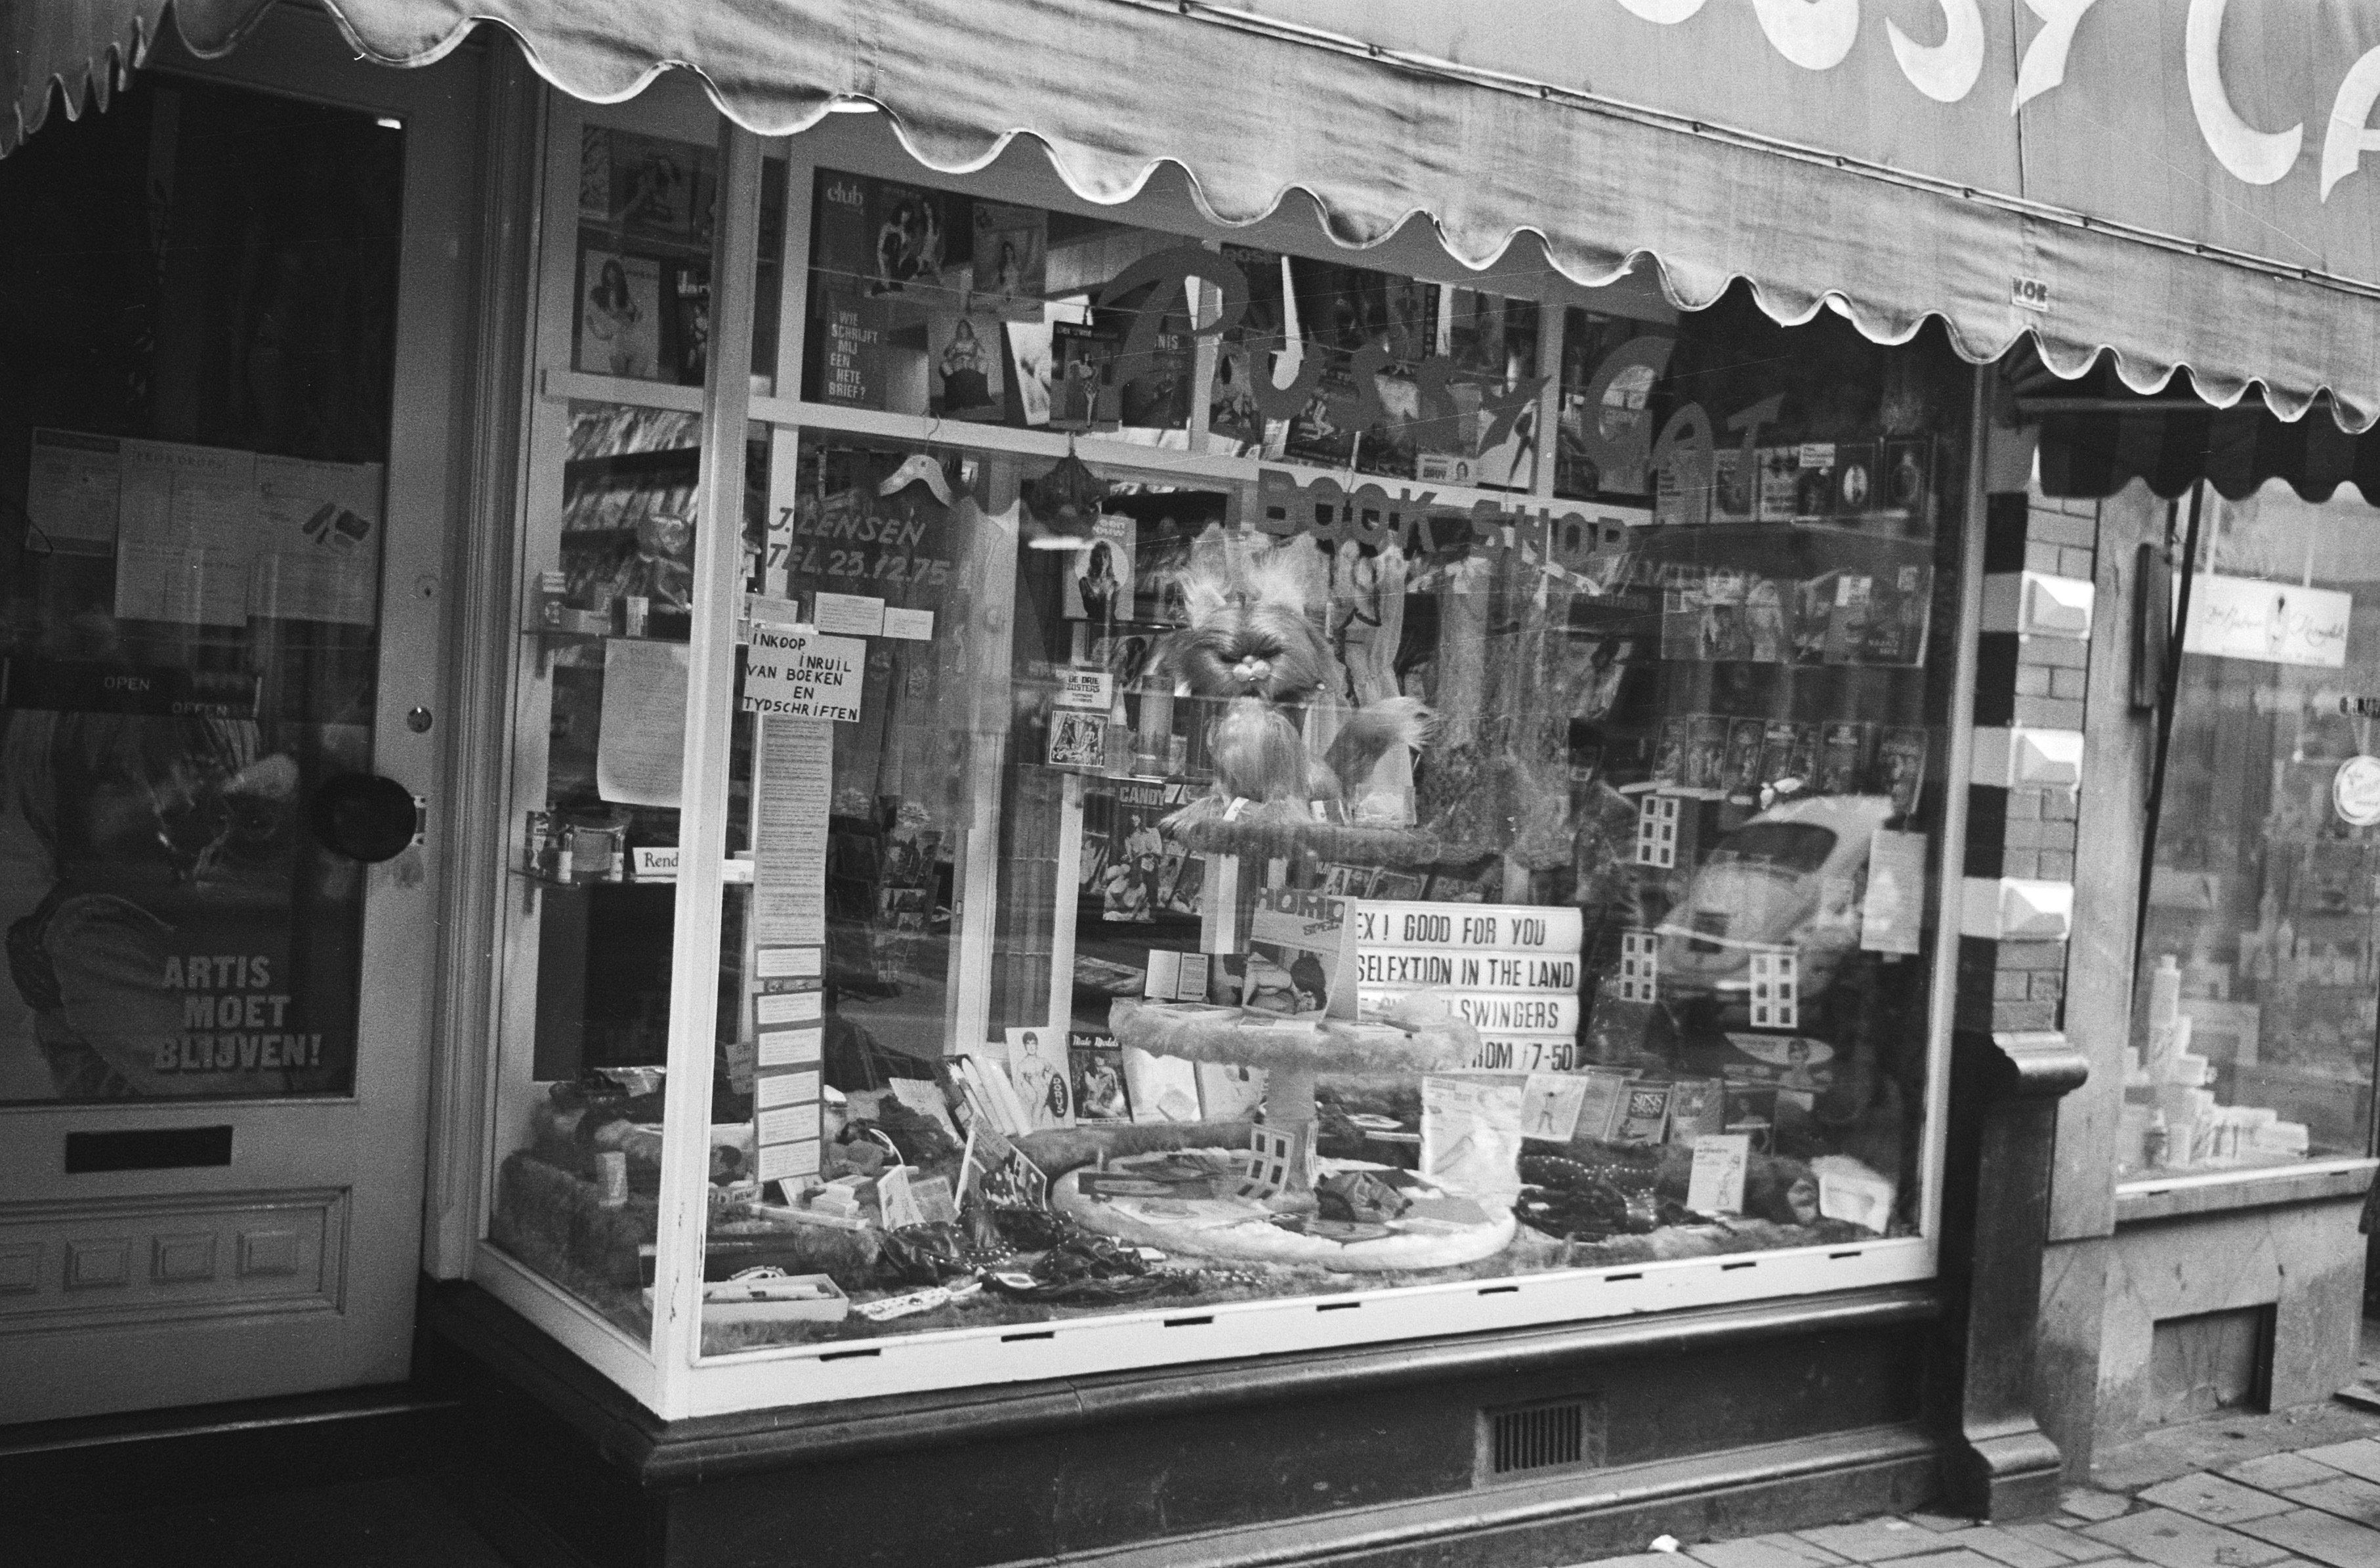 amsterdampussycatbookshop1971.jpg